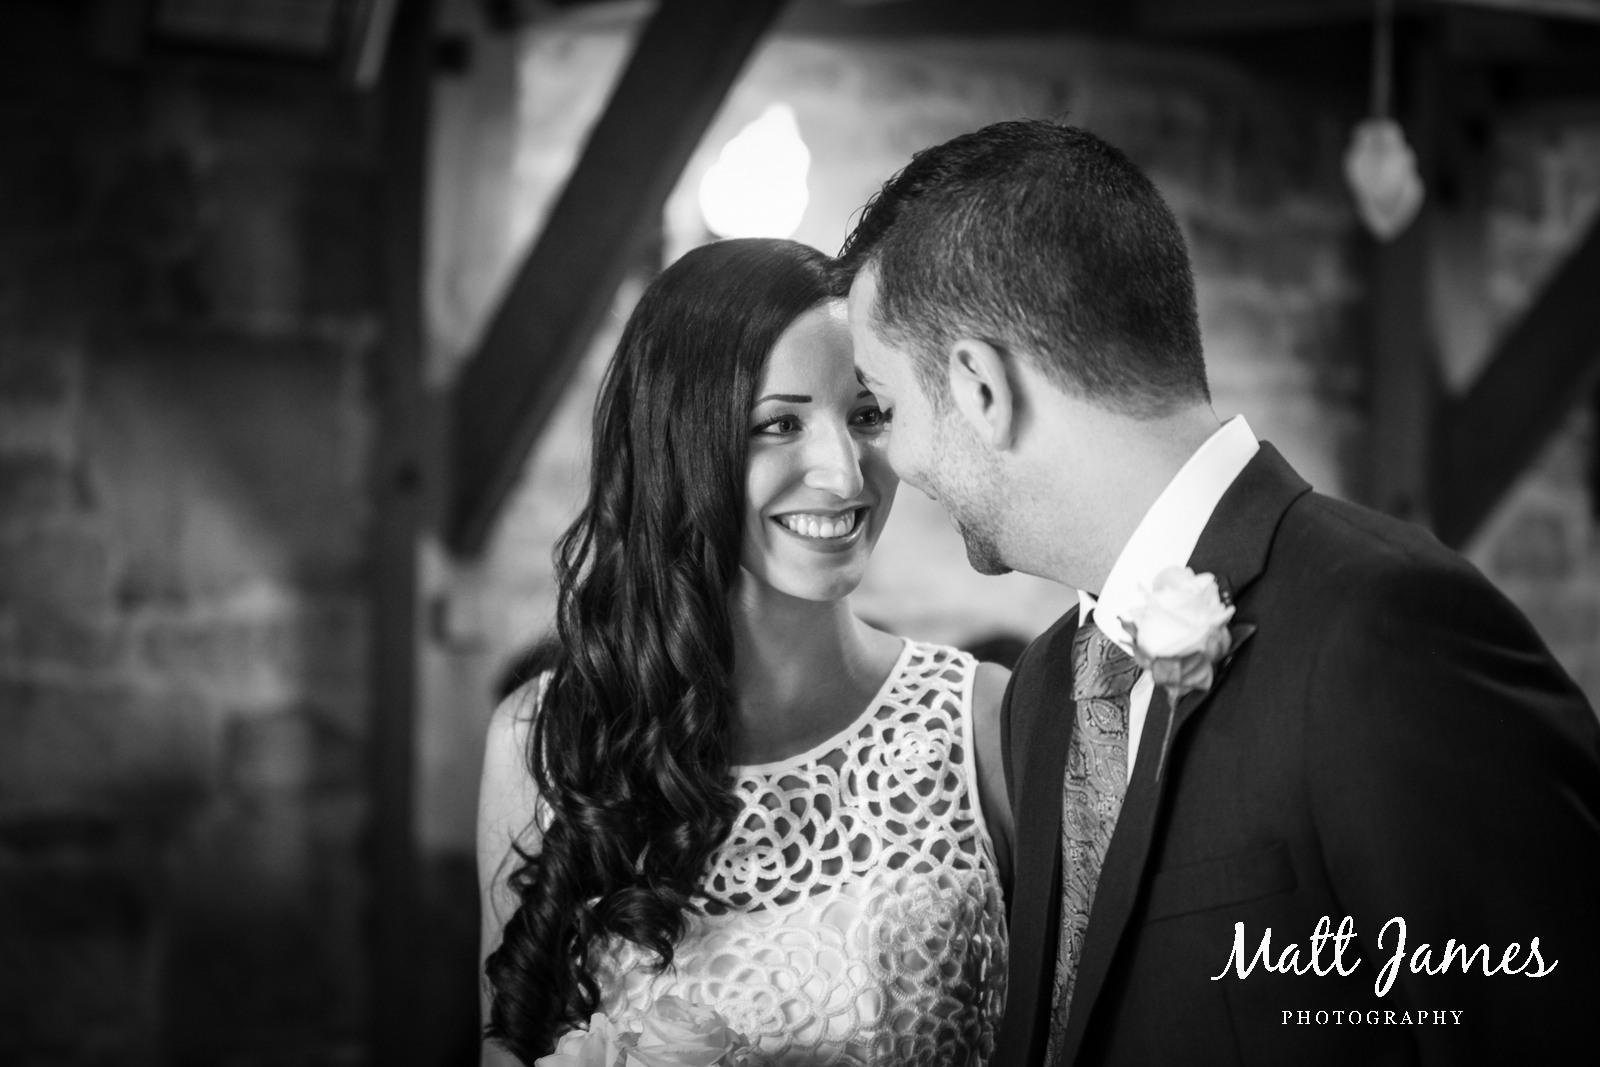 Sevenoaks-documentary-wedding-photographer-179